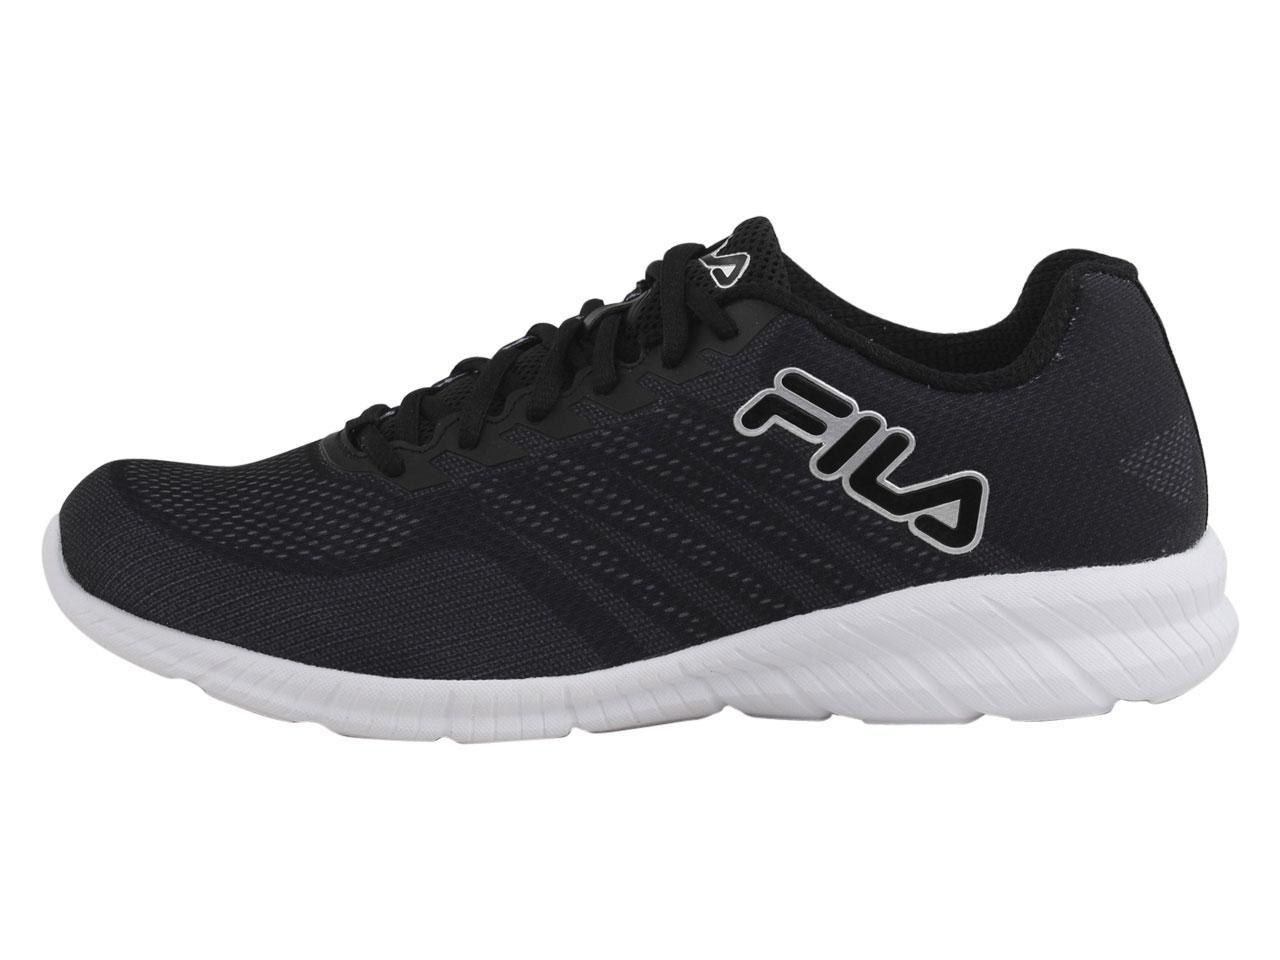 a4e1003c13fa8 Fila Men s Windracer-3 Memory Foam Running Sneakers Shoes